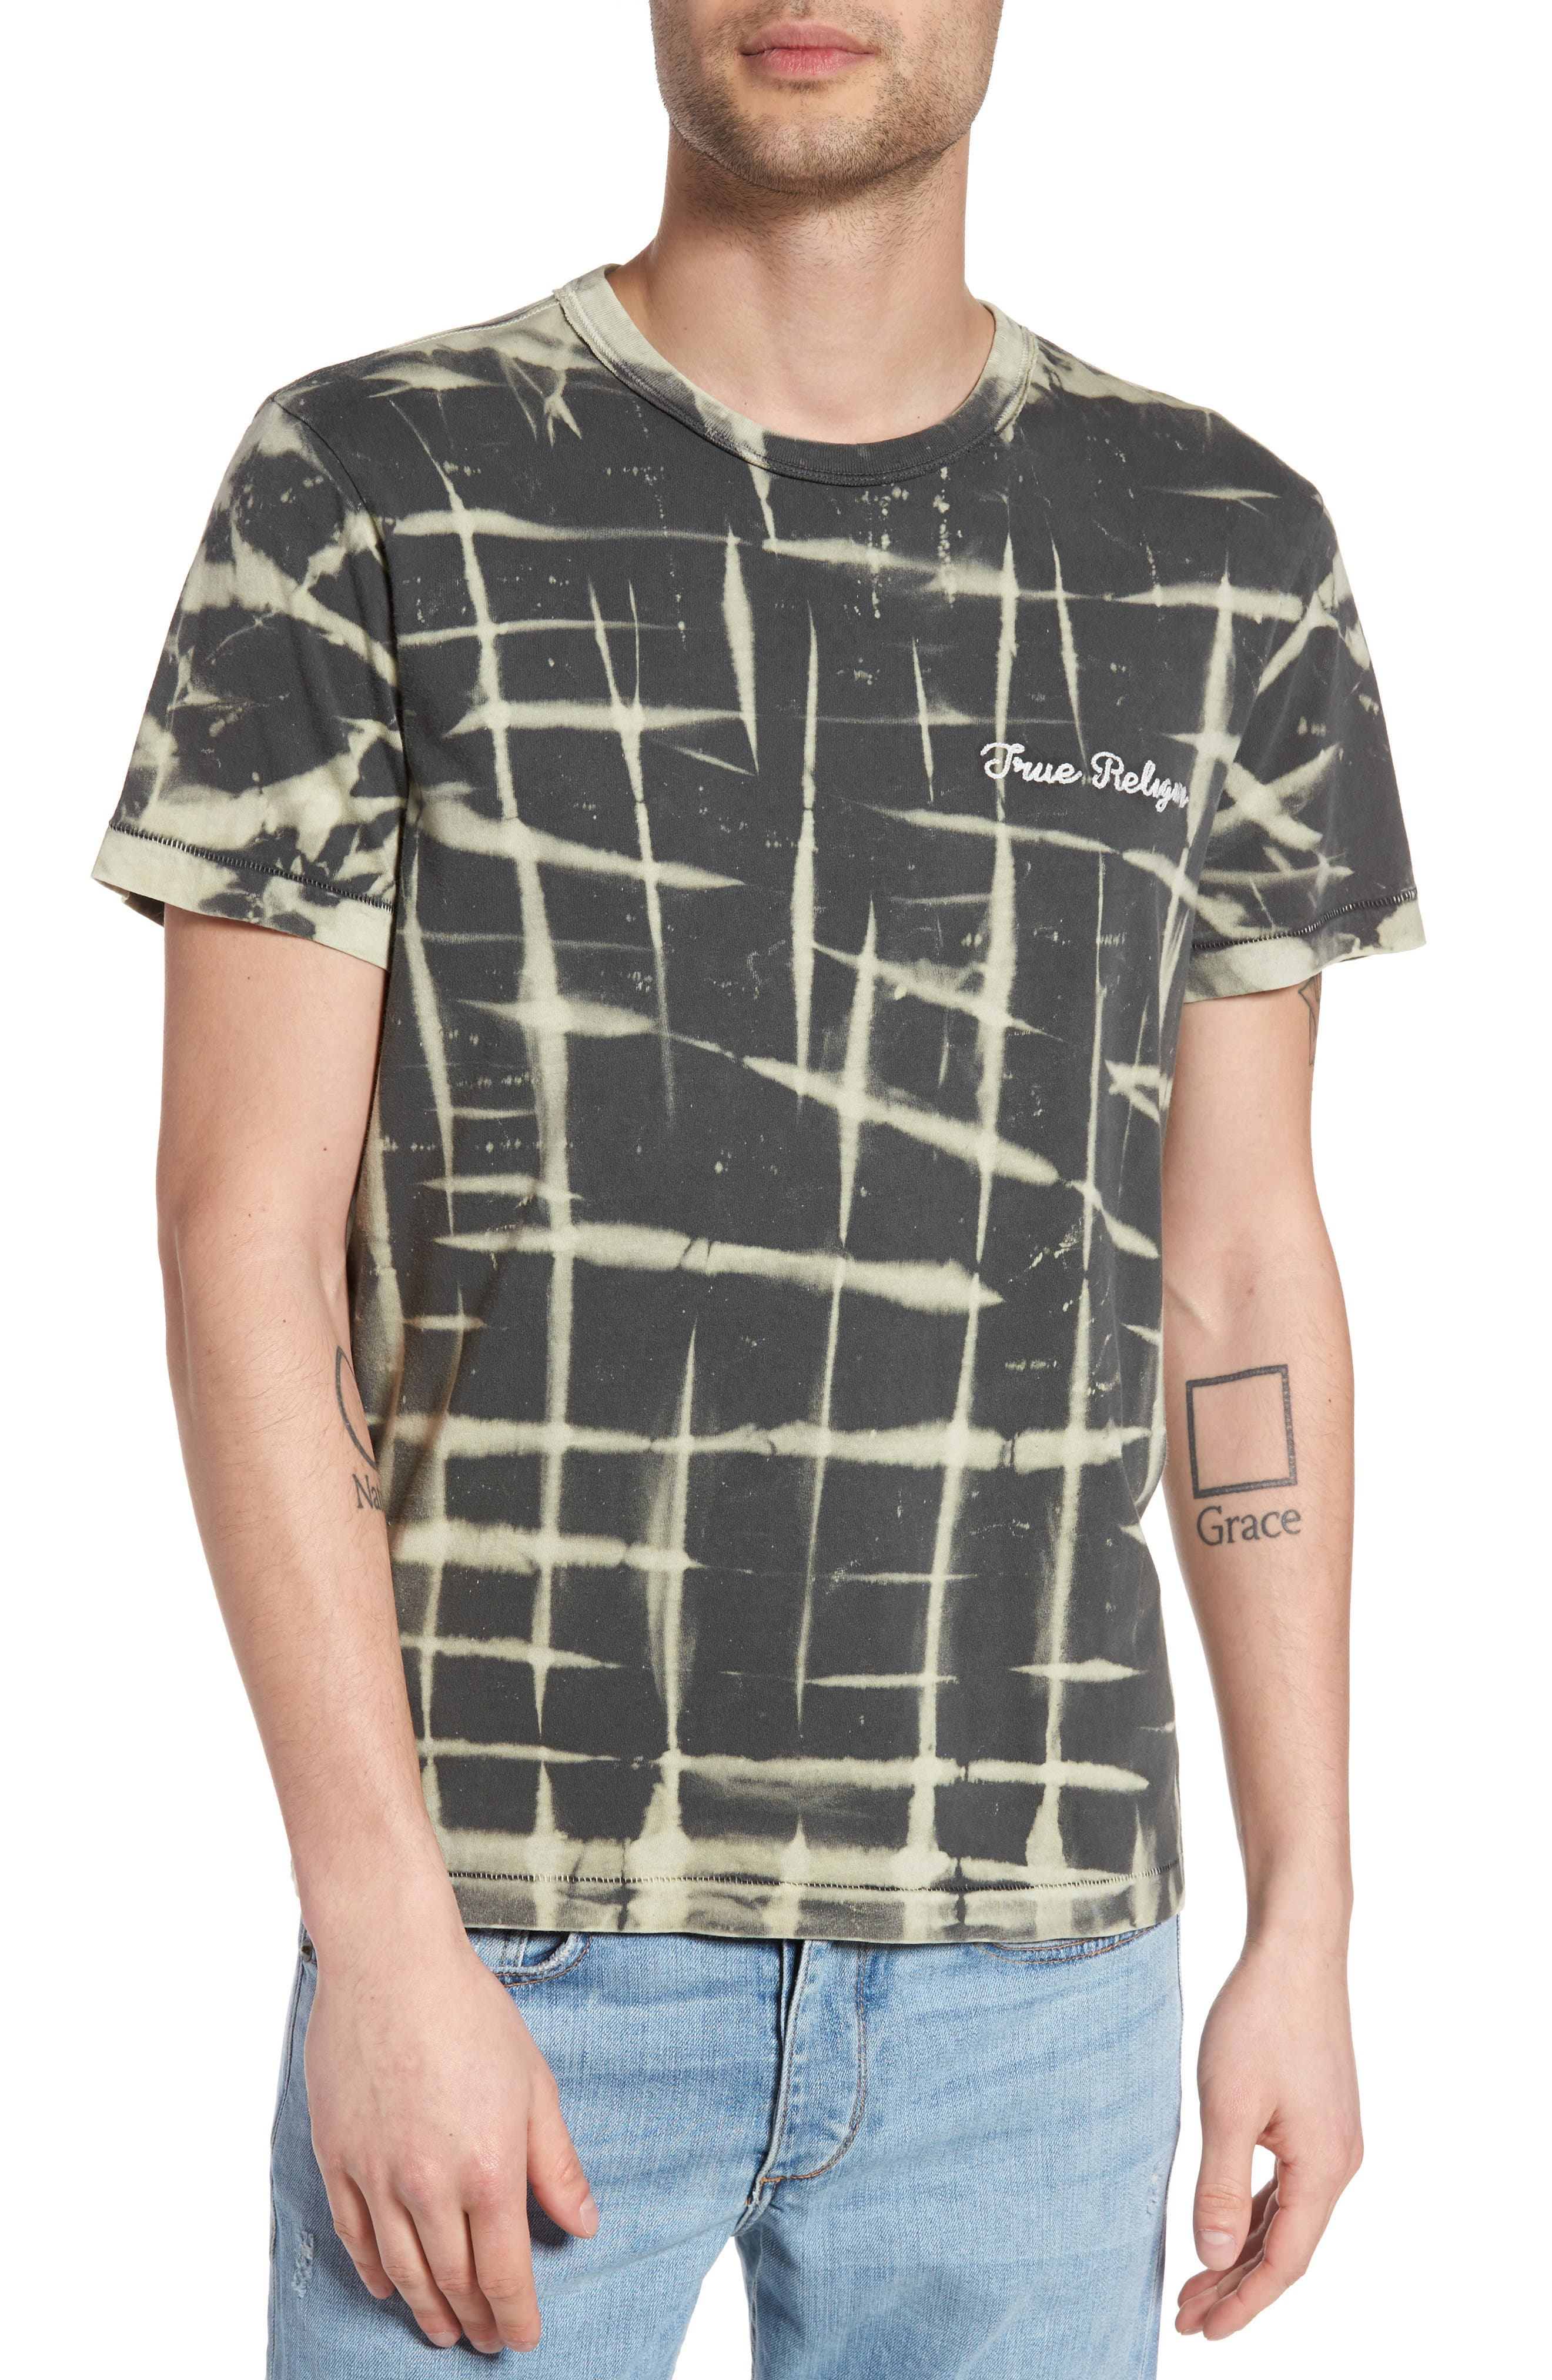 True Religion Brand Jeans Tie Dye T-Shirt